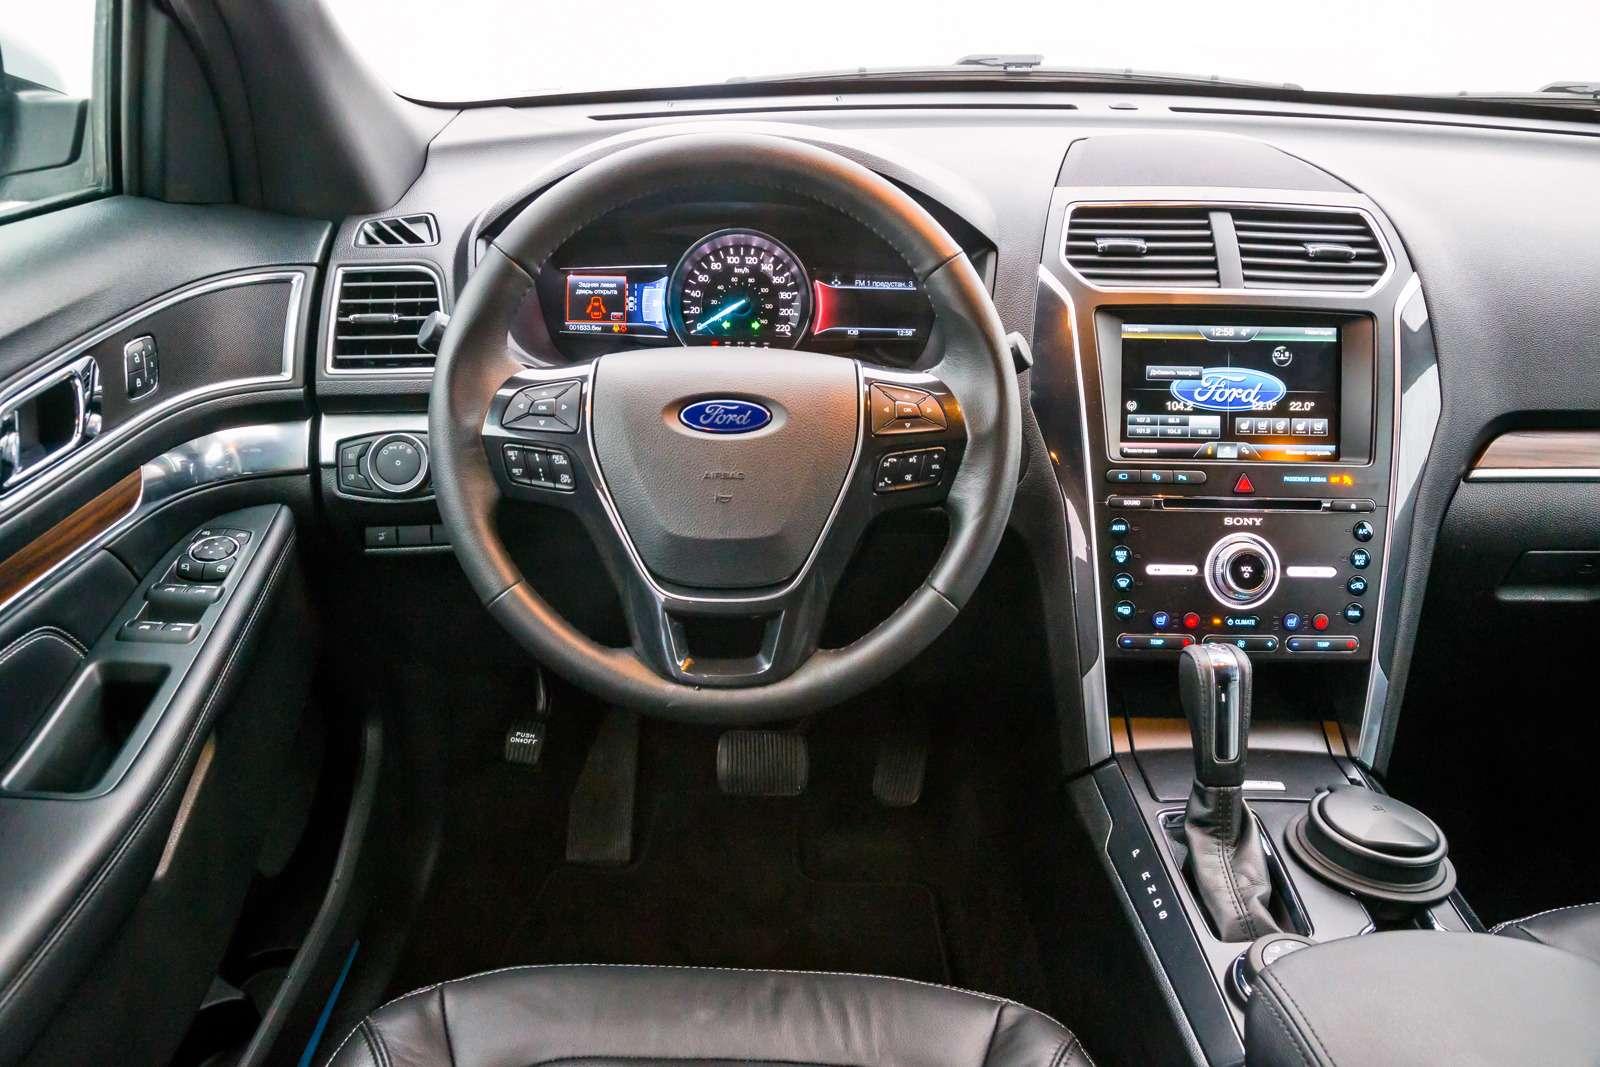 02-Ford-Explorer_zr-01_16